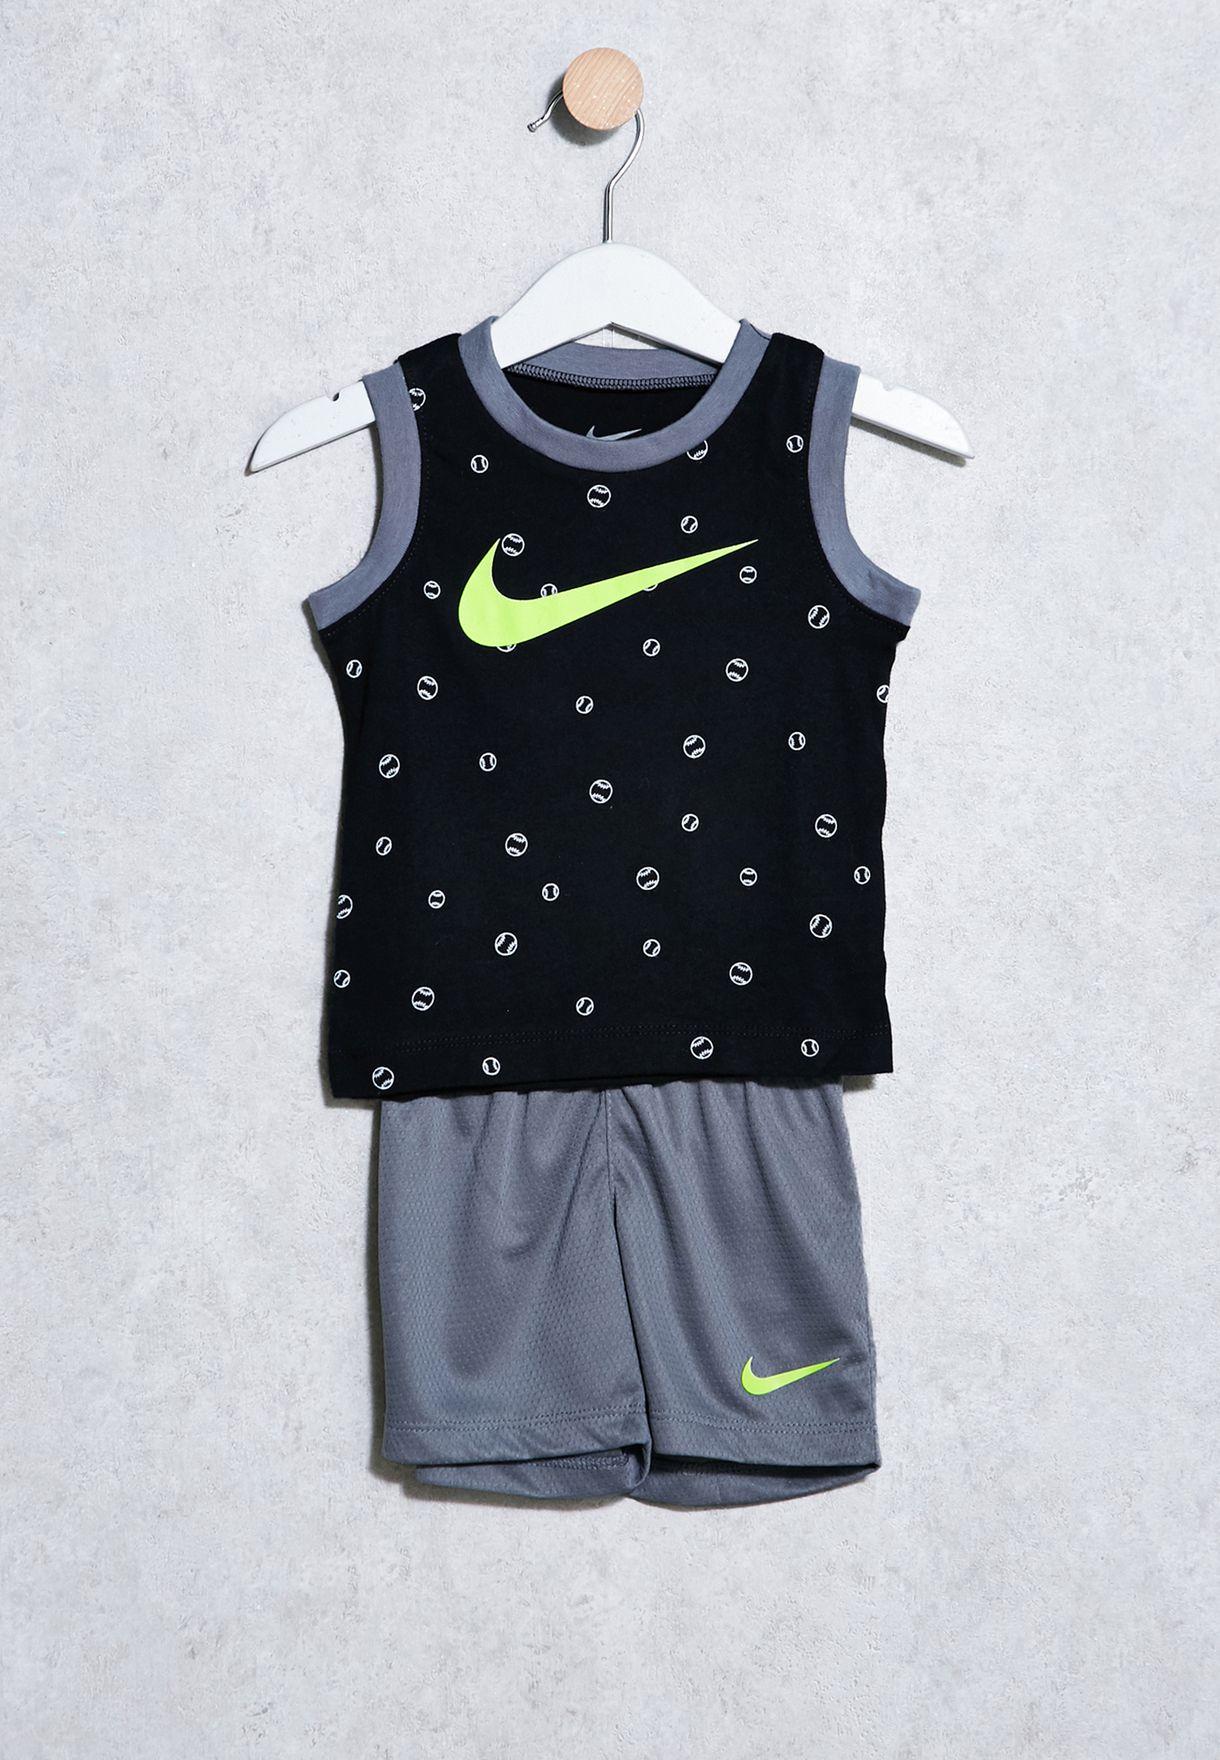 7a62287ae Shop Nike grey Infant Printed T-Shirt + Shorts Set 66C169-478 for ...